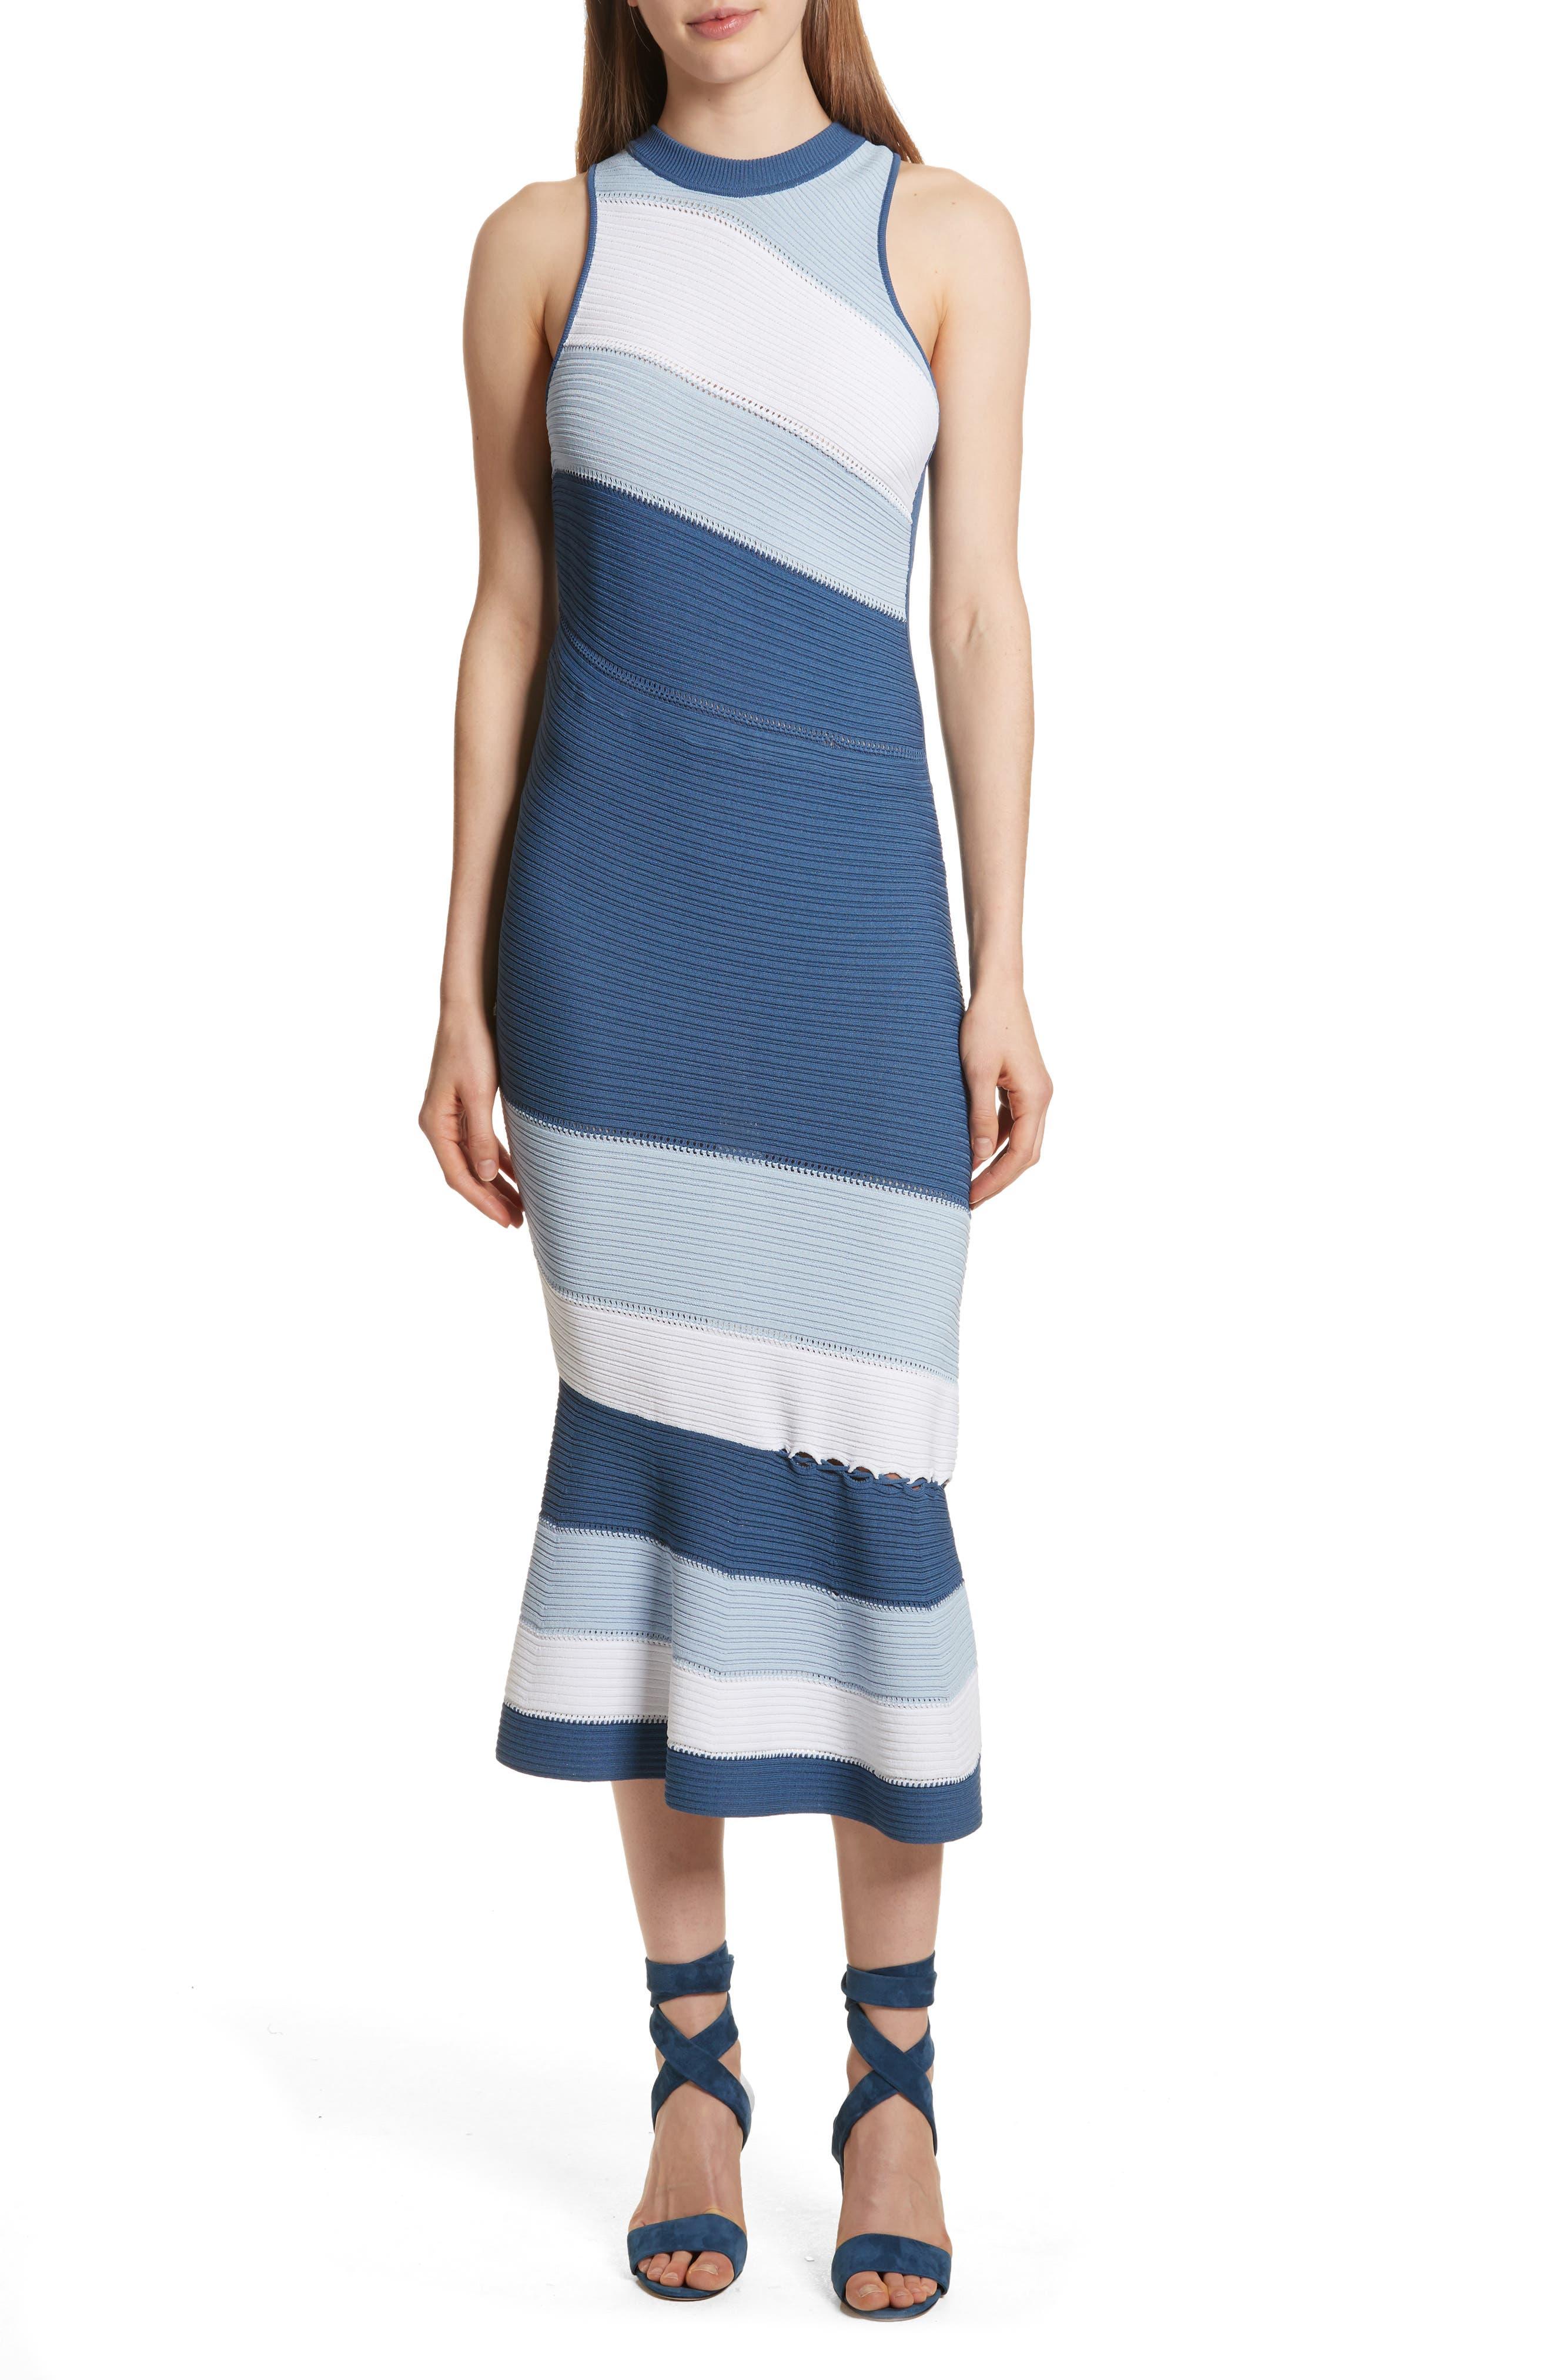 Linked Asymmetrical Dress,                         Main,                         color, Blue Combo